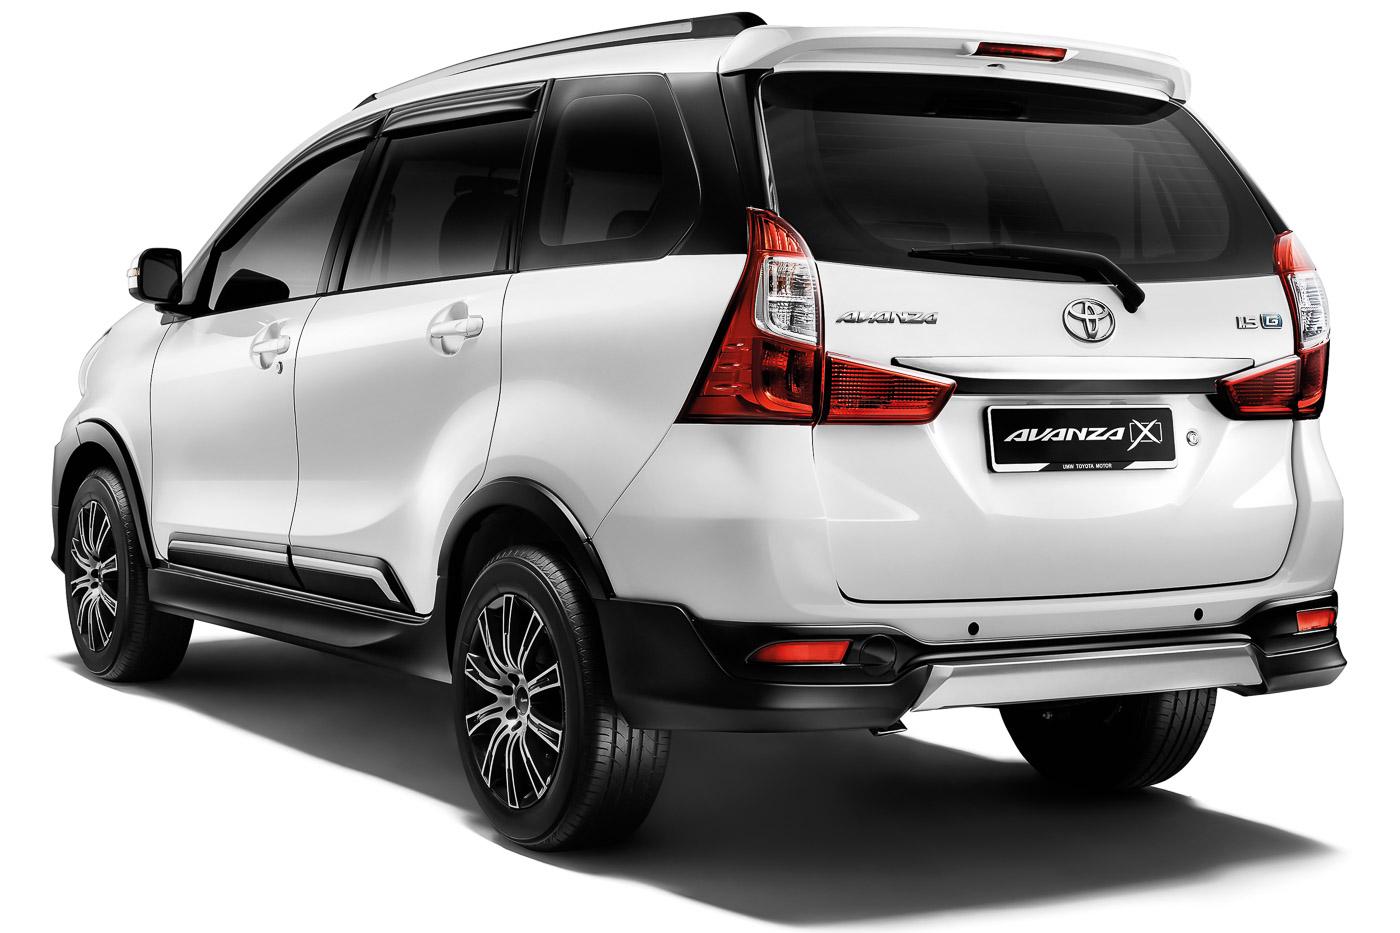 Kelebihan Toyota Avanza 2018 Murah Berkualitas